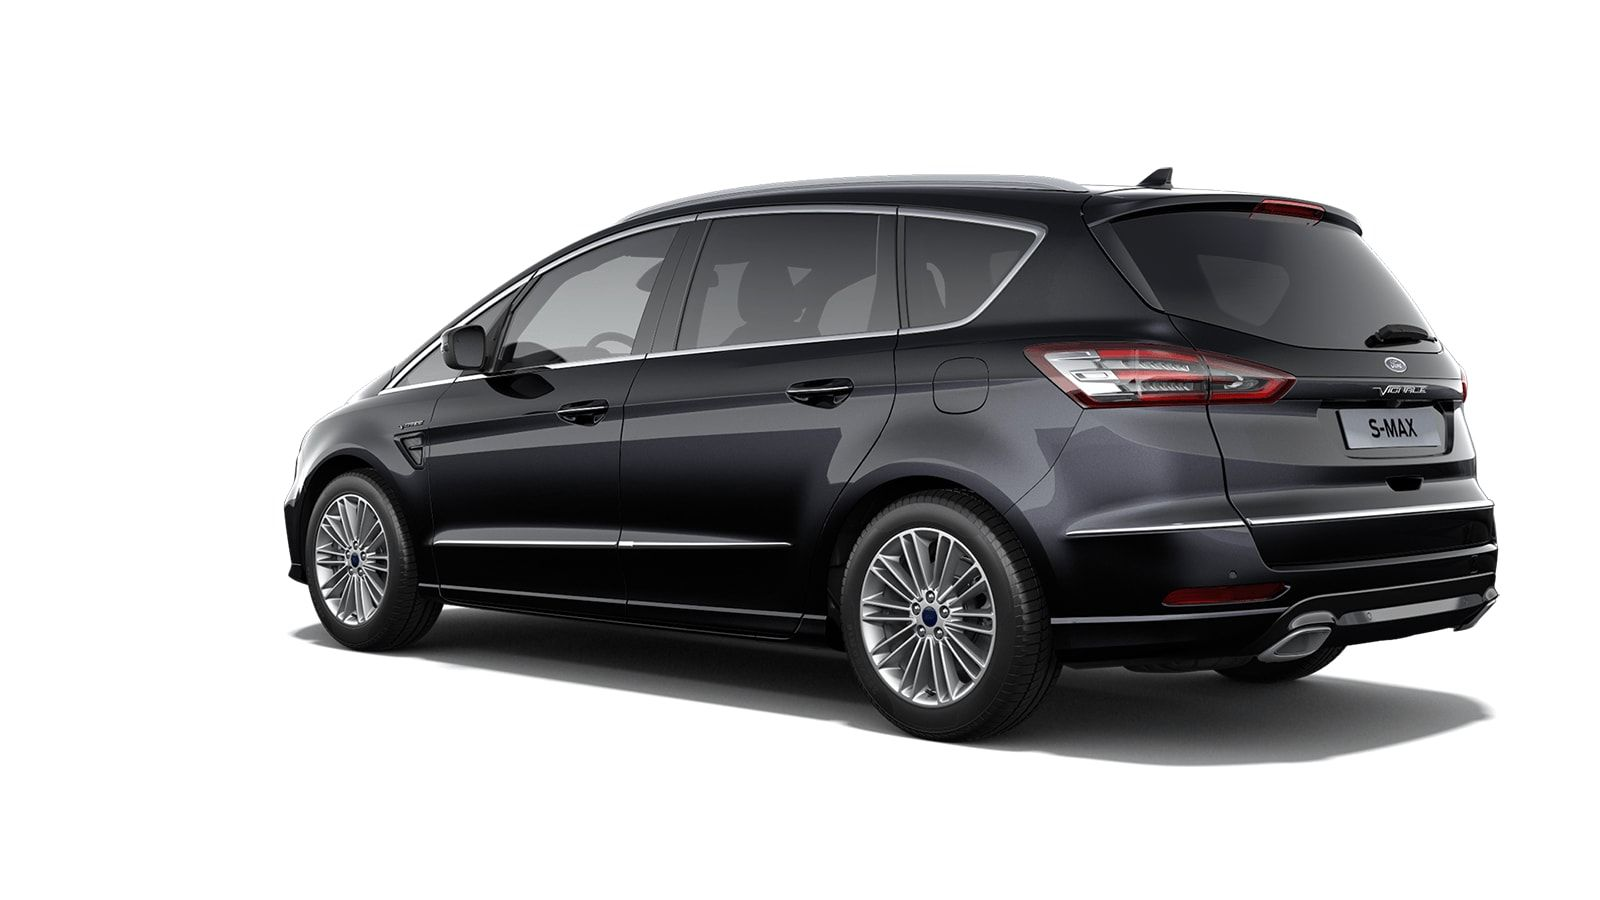 "Nieuw Ford S-max Vignale 2.0 TDCi 190pk / 139kW Auto-Start-Stop A8 - 5d 9I6 - ""Agate Black Vignale"" metaalkleur 2"